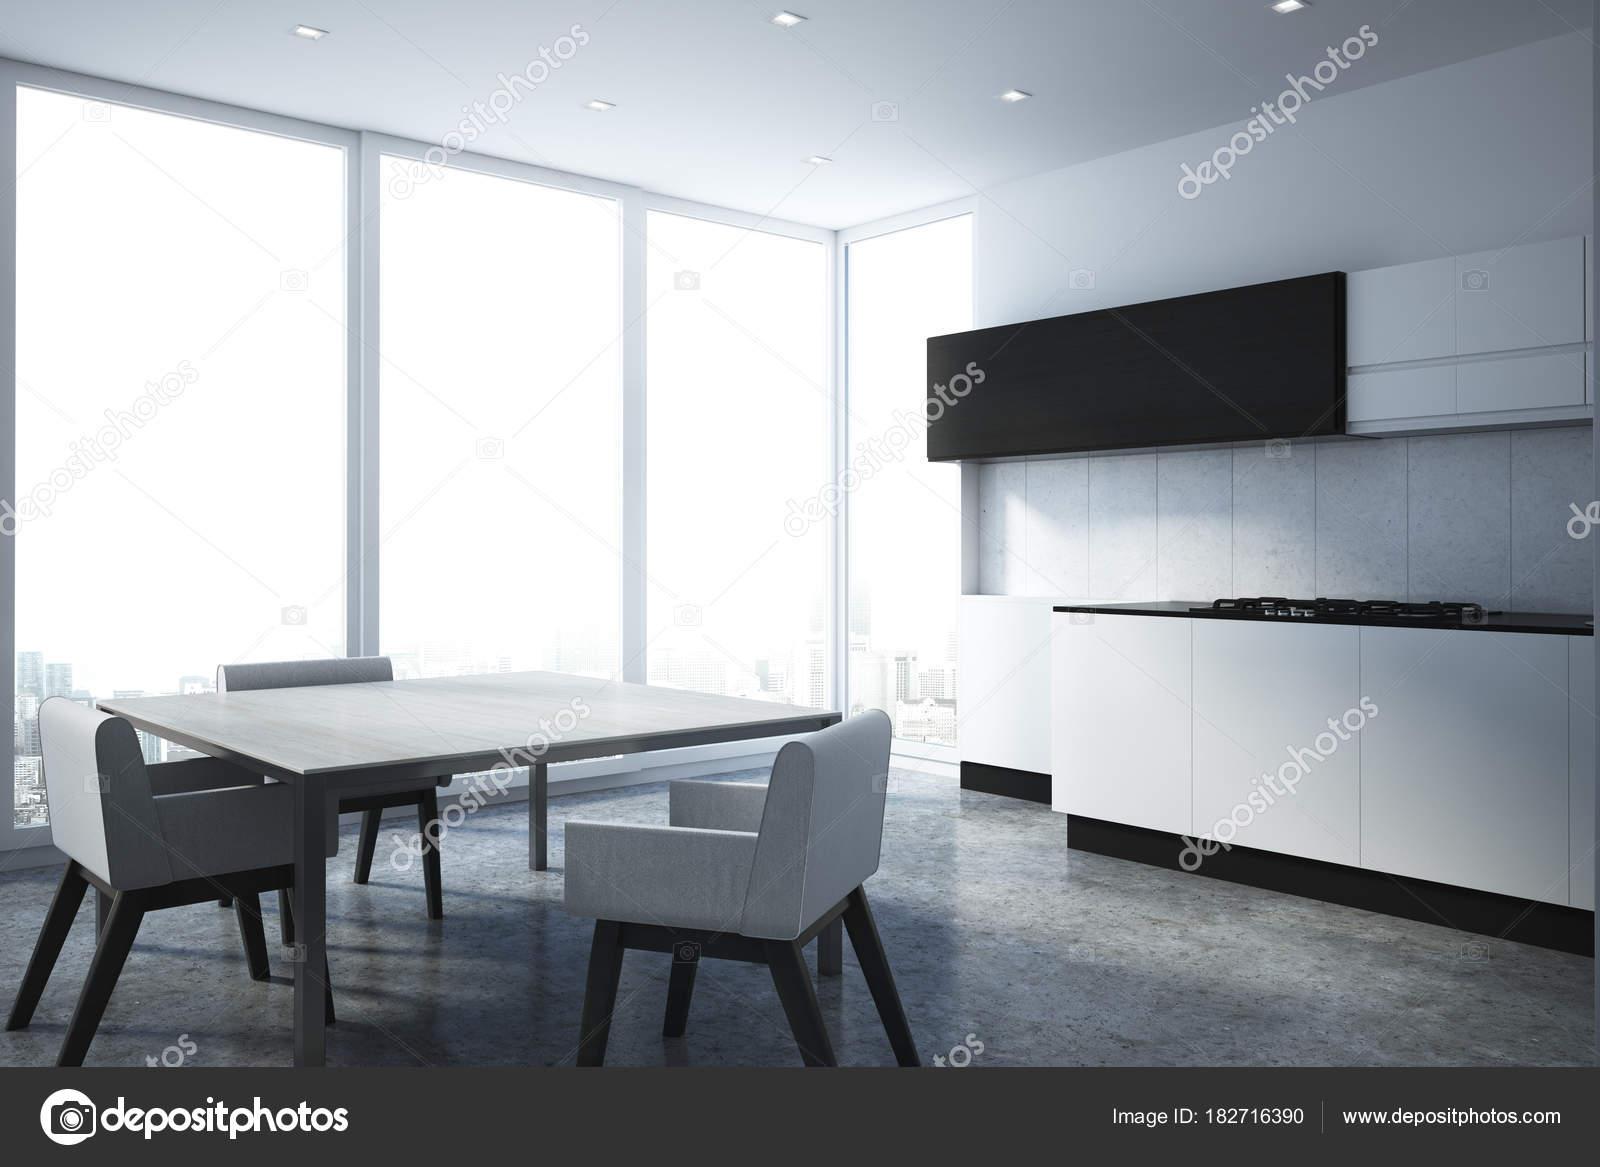 Saubere Küche Interieur — Stockfoto © peshkova #182716390